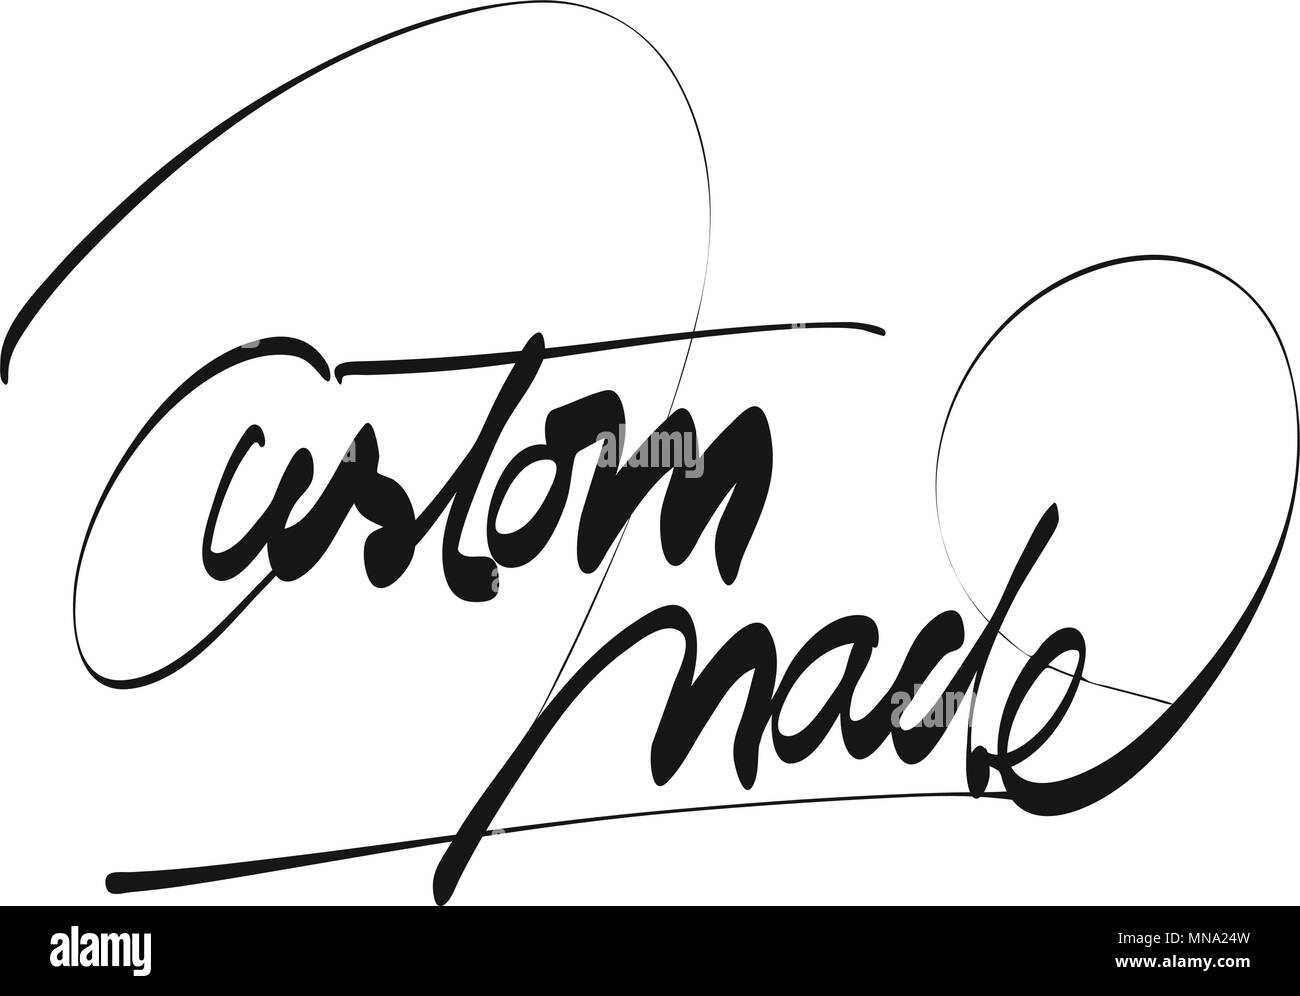 Custom Made Titel Hand Schriftzug, Vektor skizzieren